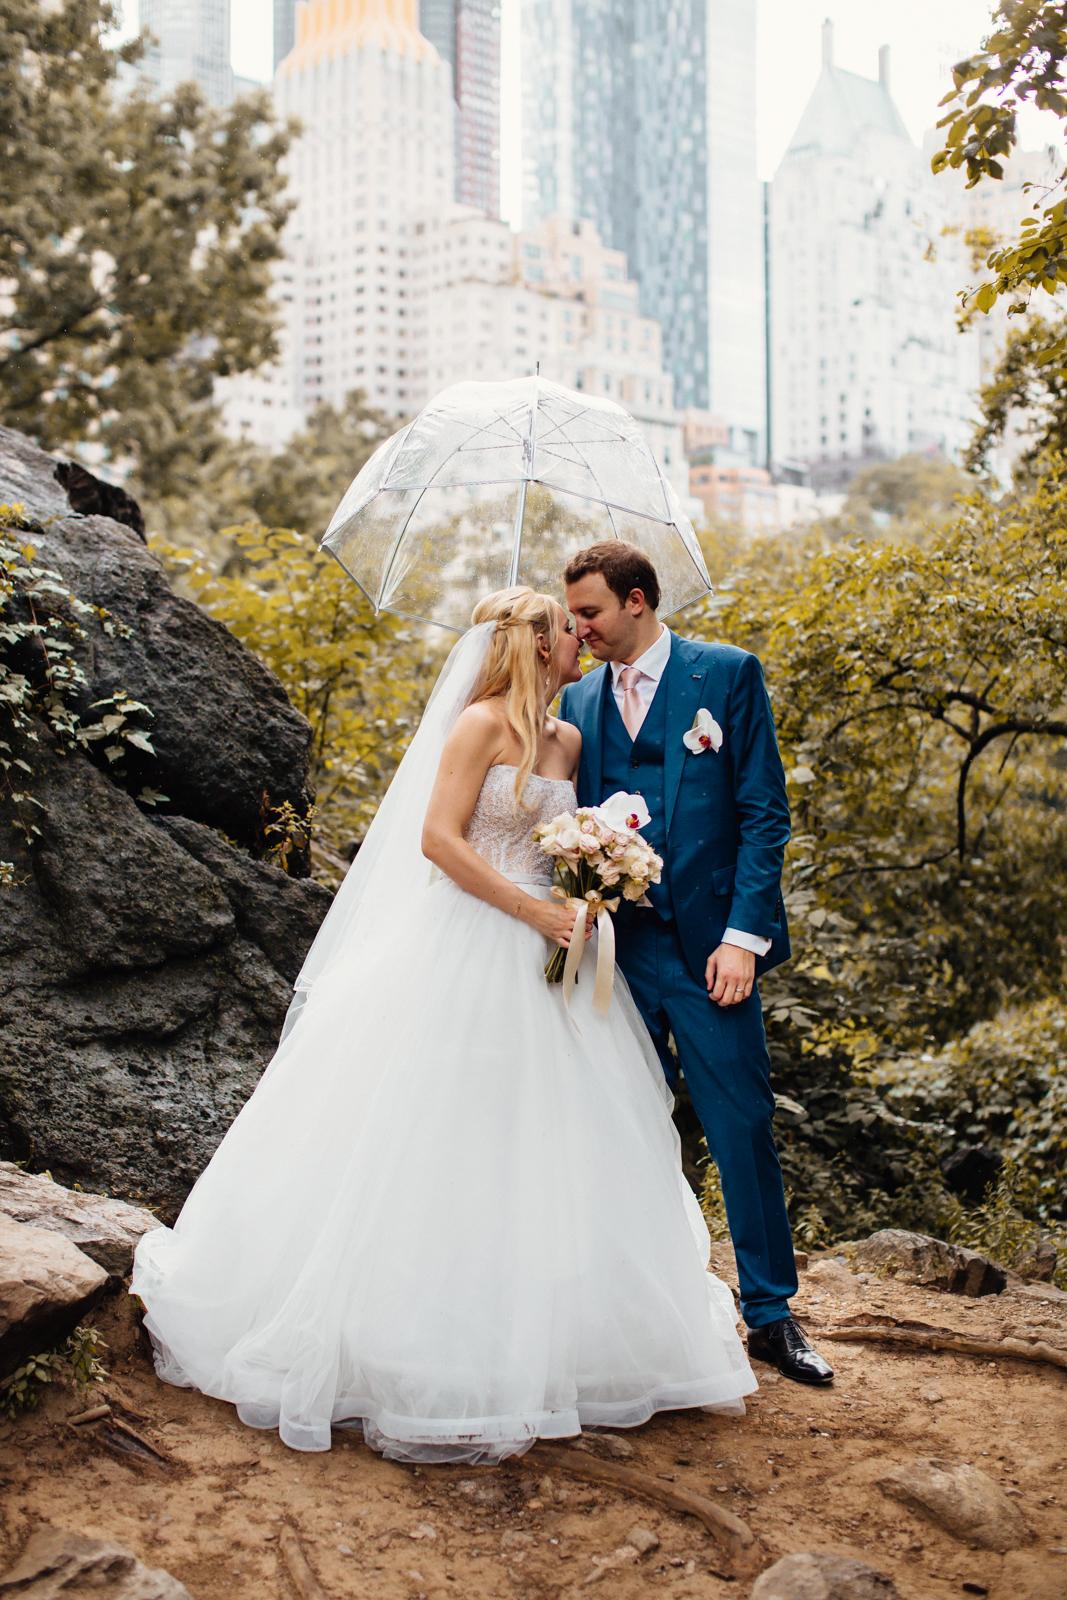 NYC Wedding Photography Sofitel Central Park Brooklyn Photographer Boris Zaretsky _B2C2562.jpg